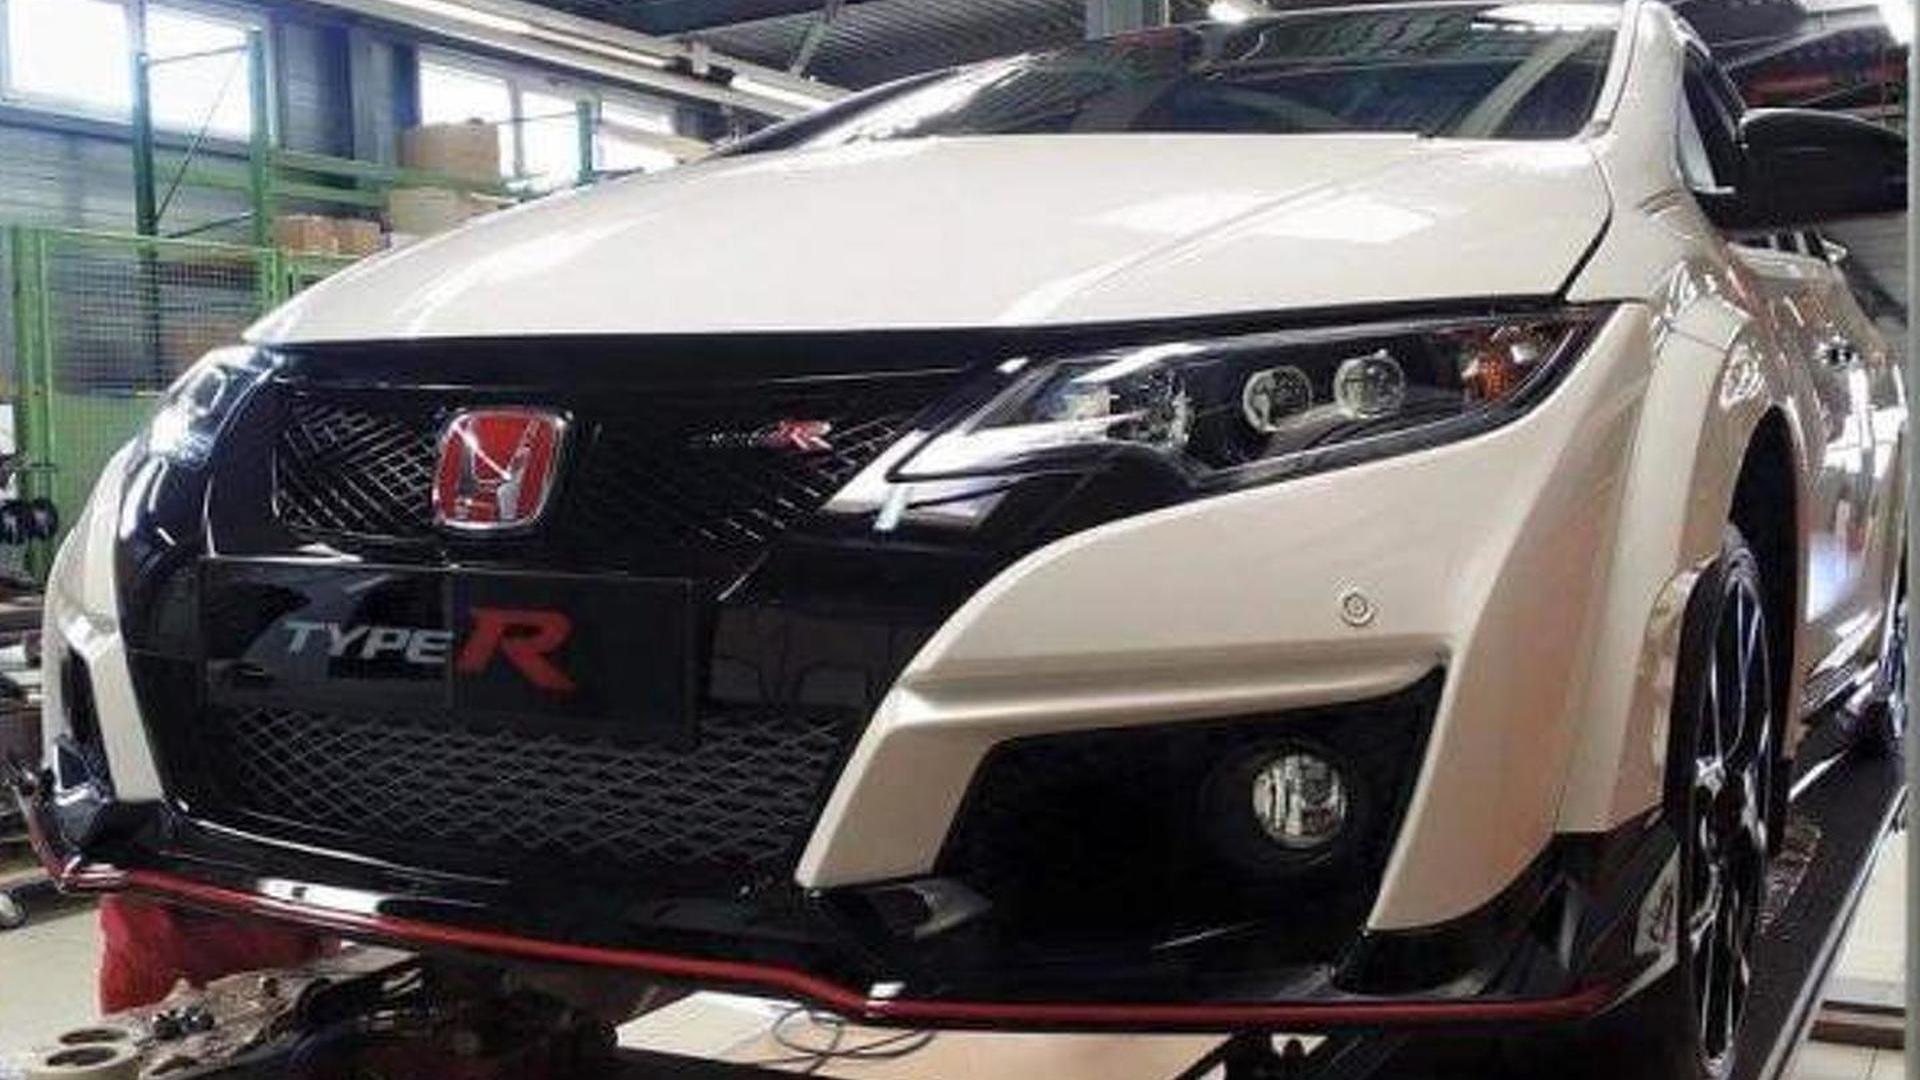 Honda Civic Type R spied up close undisguised